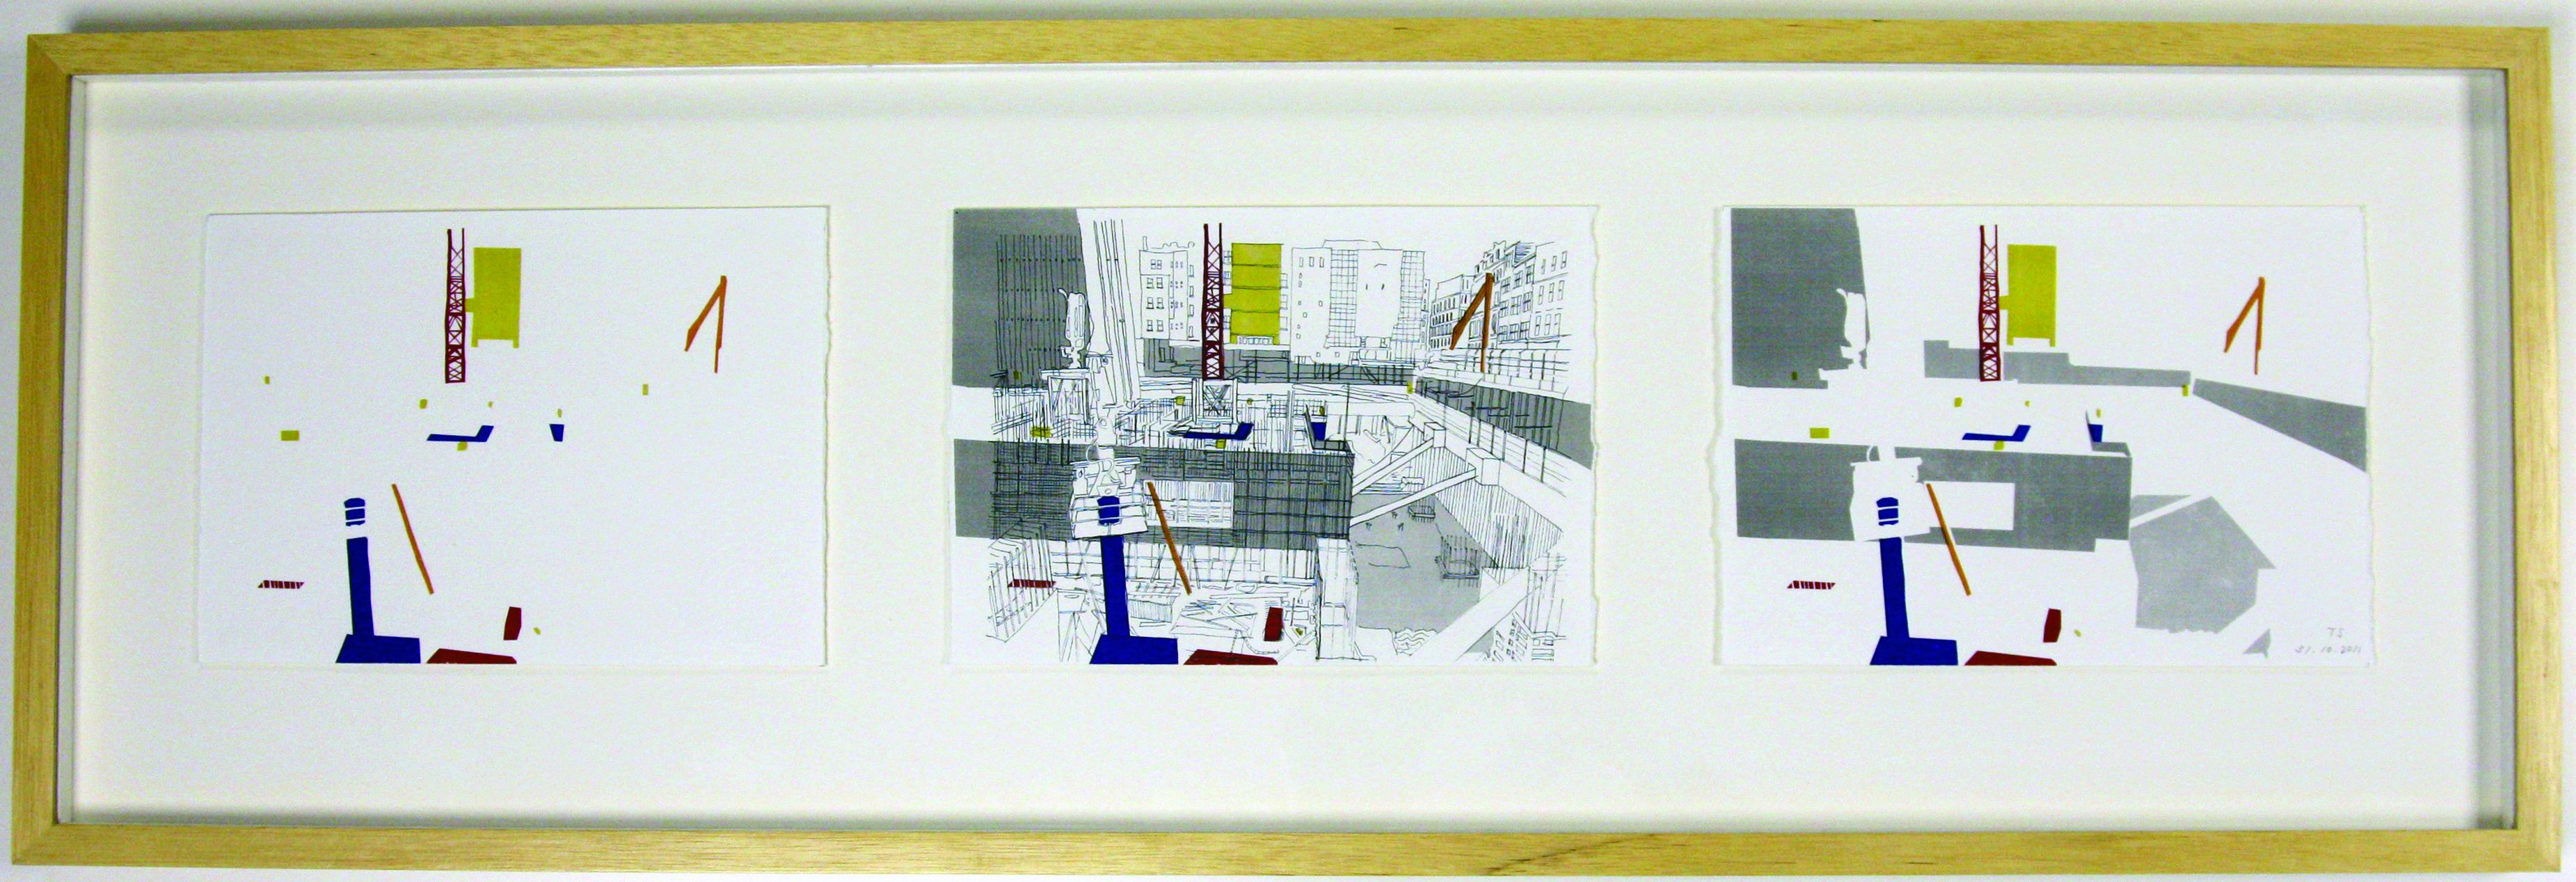 By Takero Shimazaki for 10x10 London Drawing the City 2011